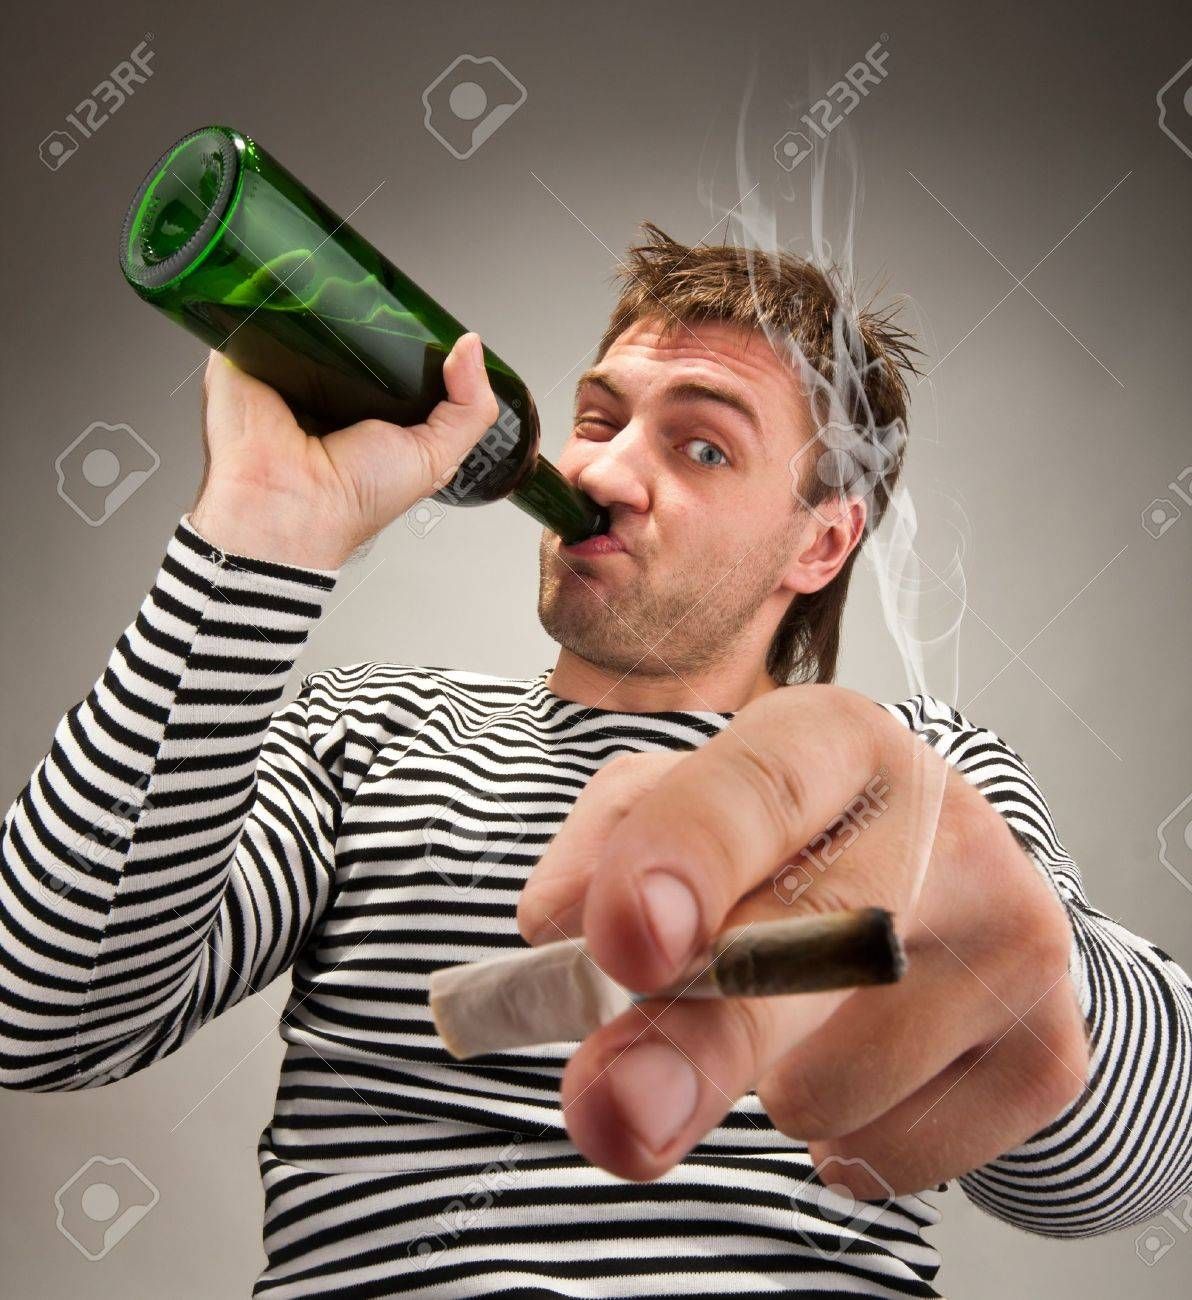 Drunk bizarre sailor with bottle and cigarette Stock Photo - 18055846